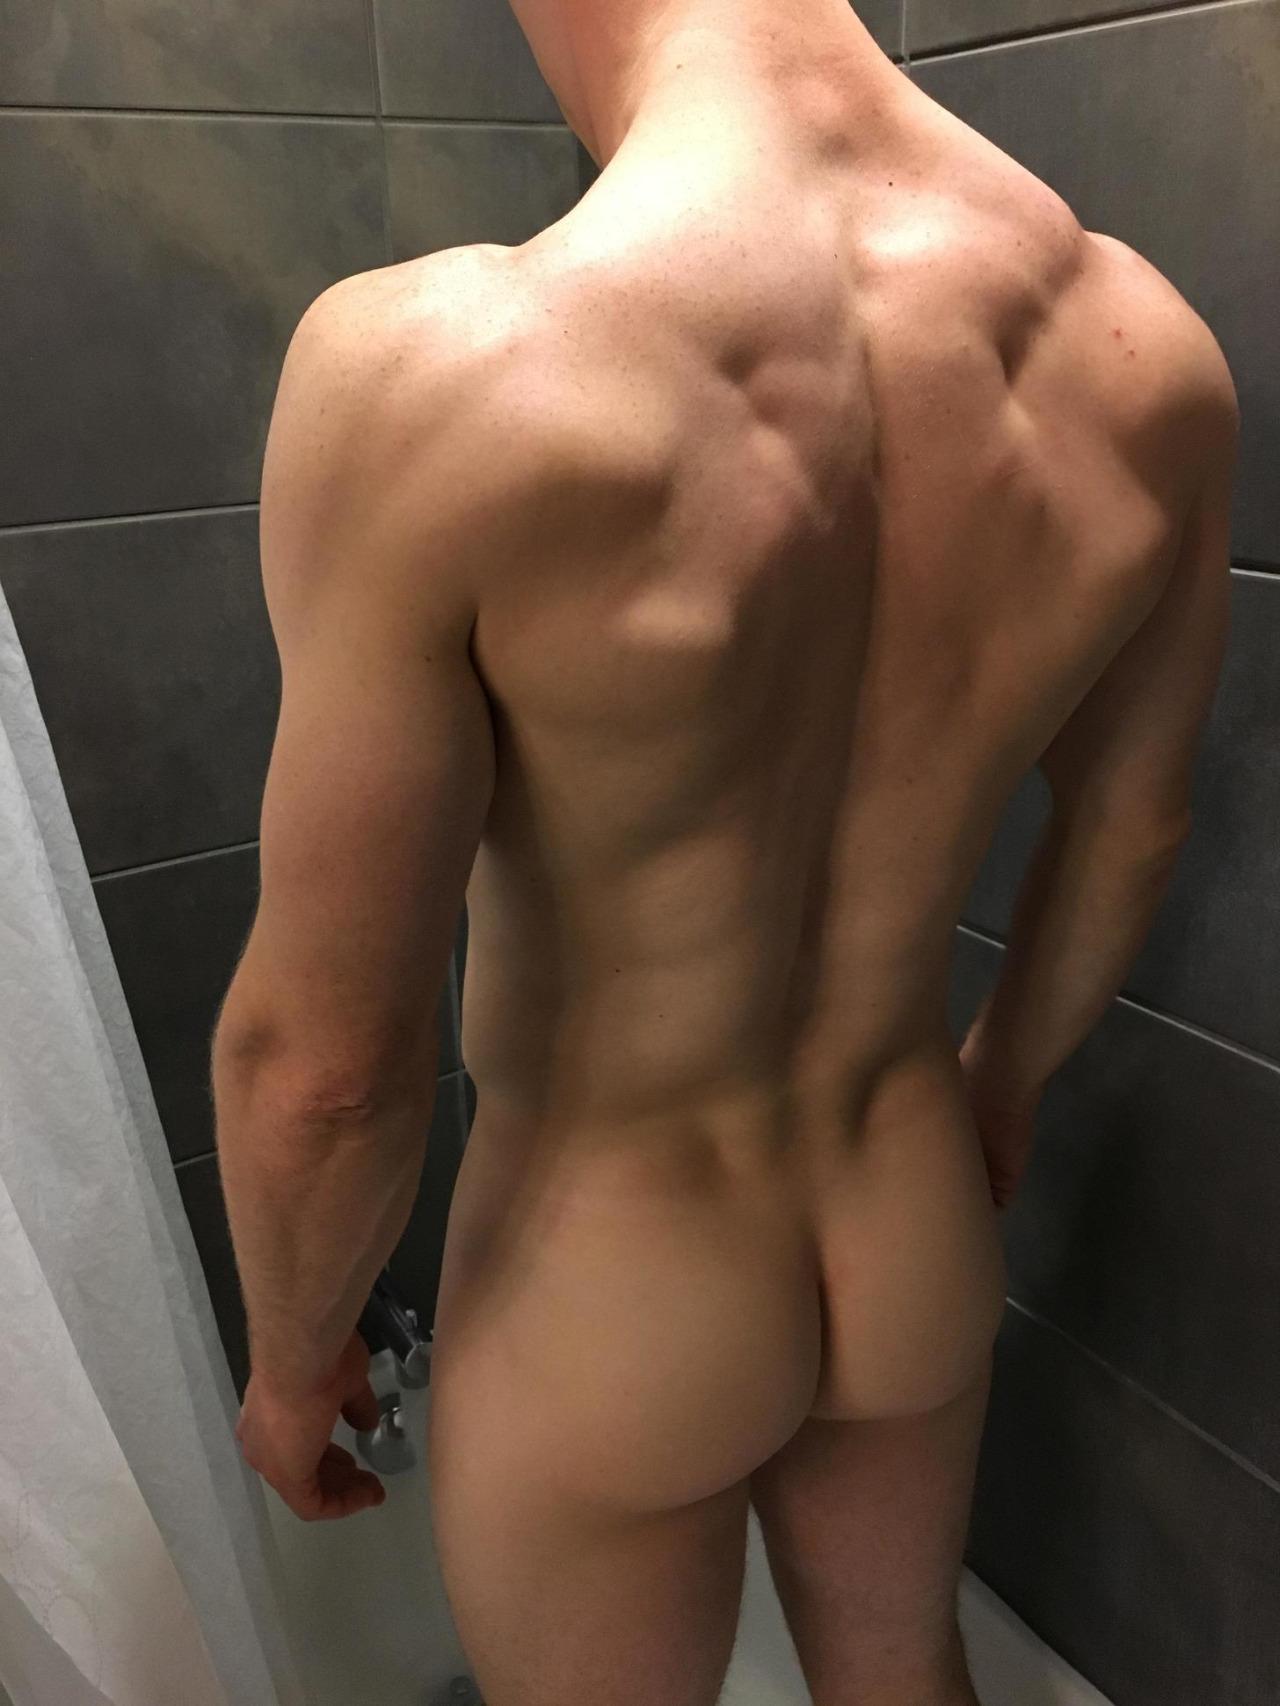 Boys naked ass